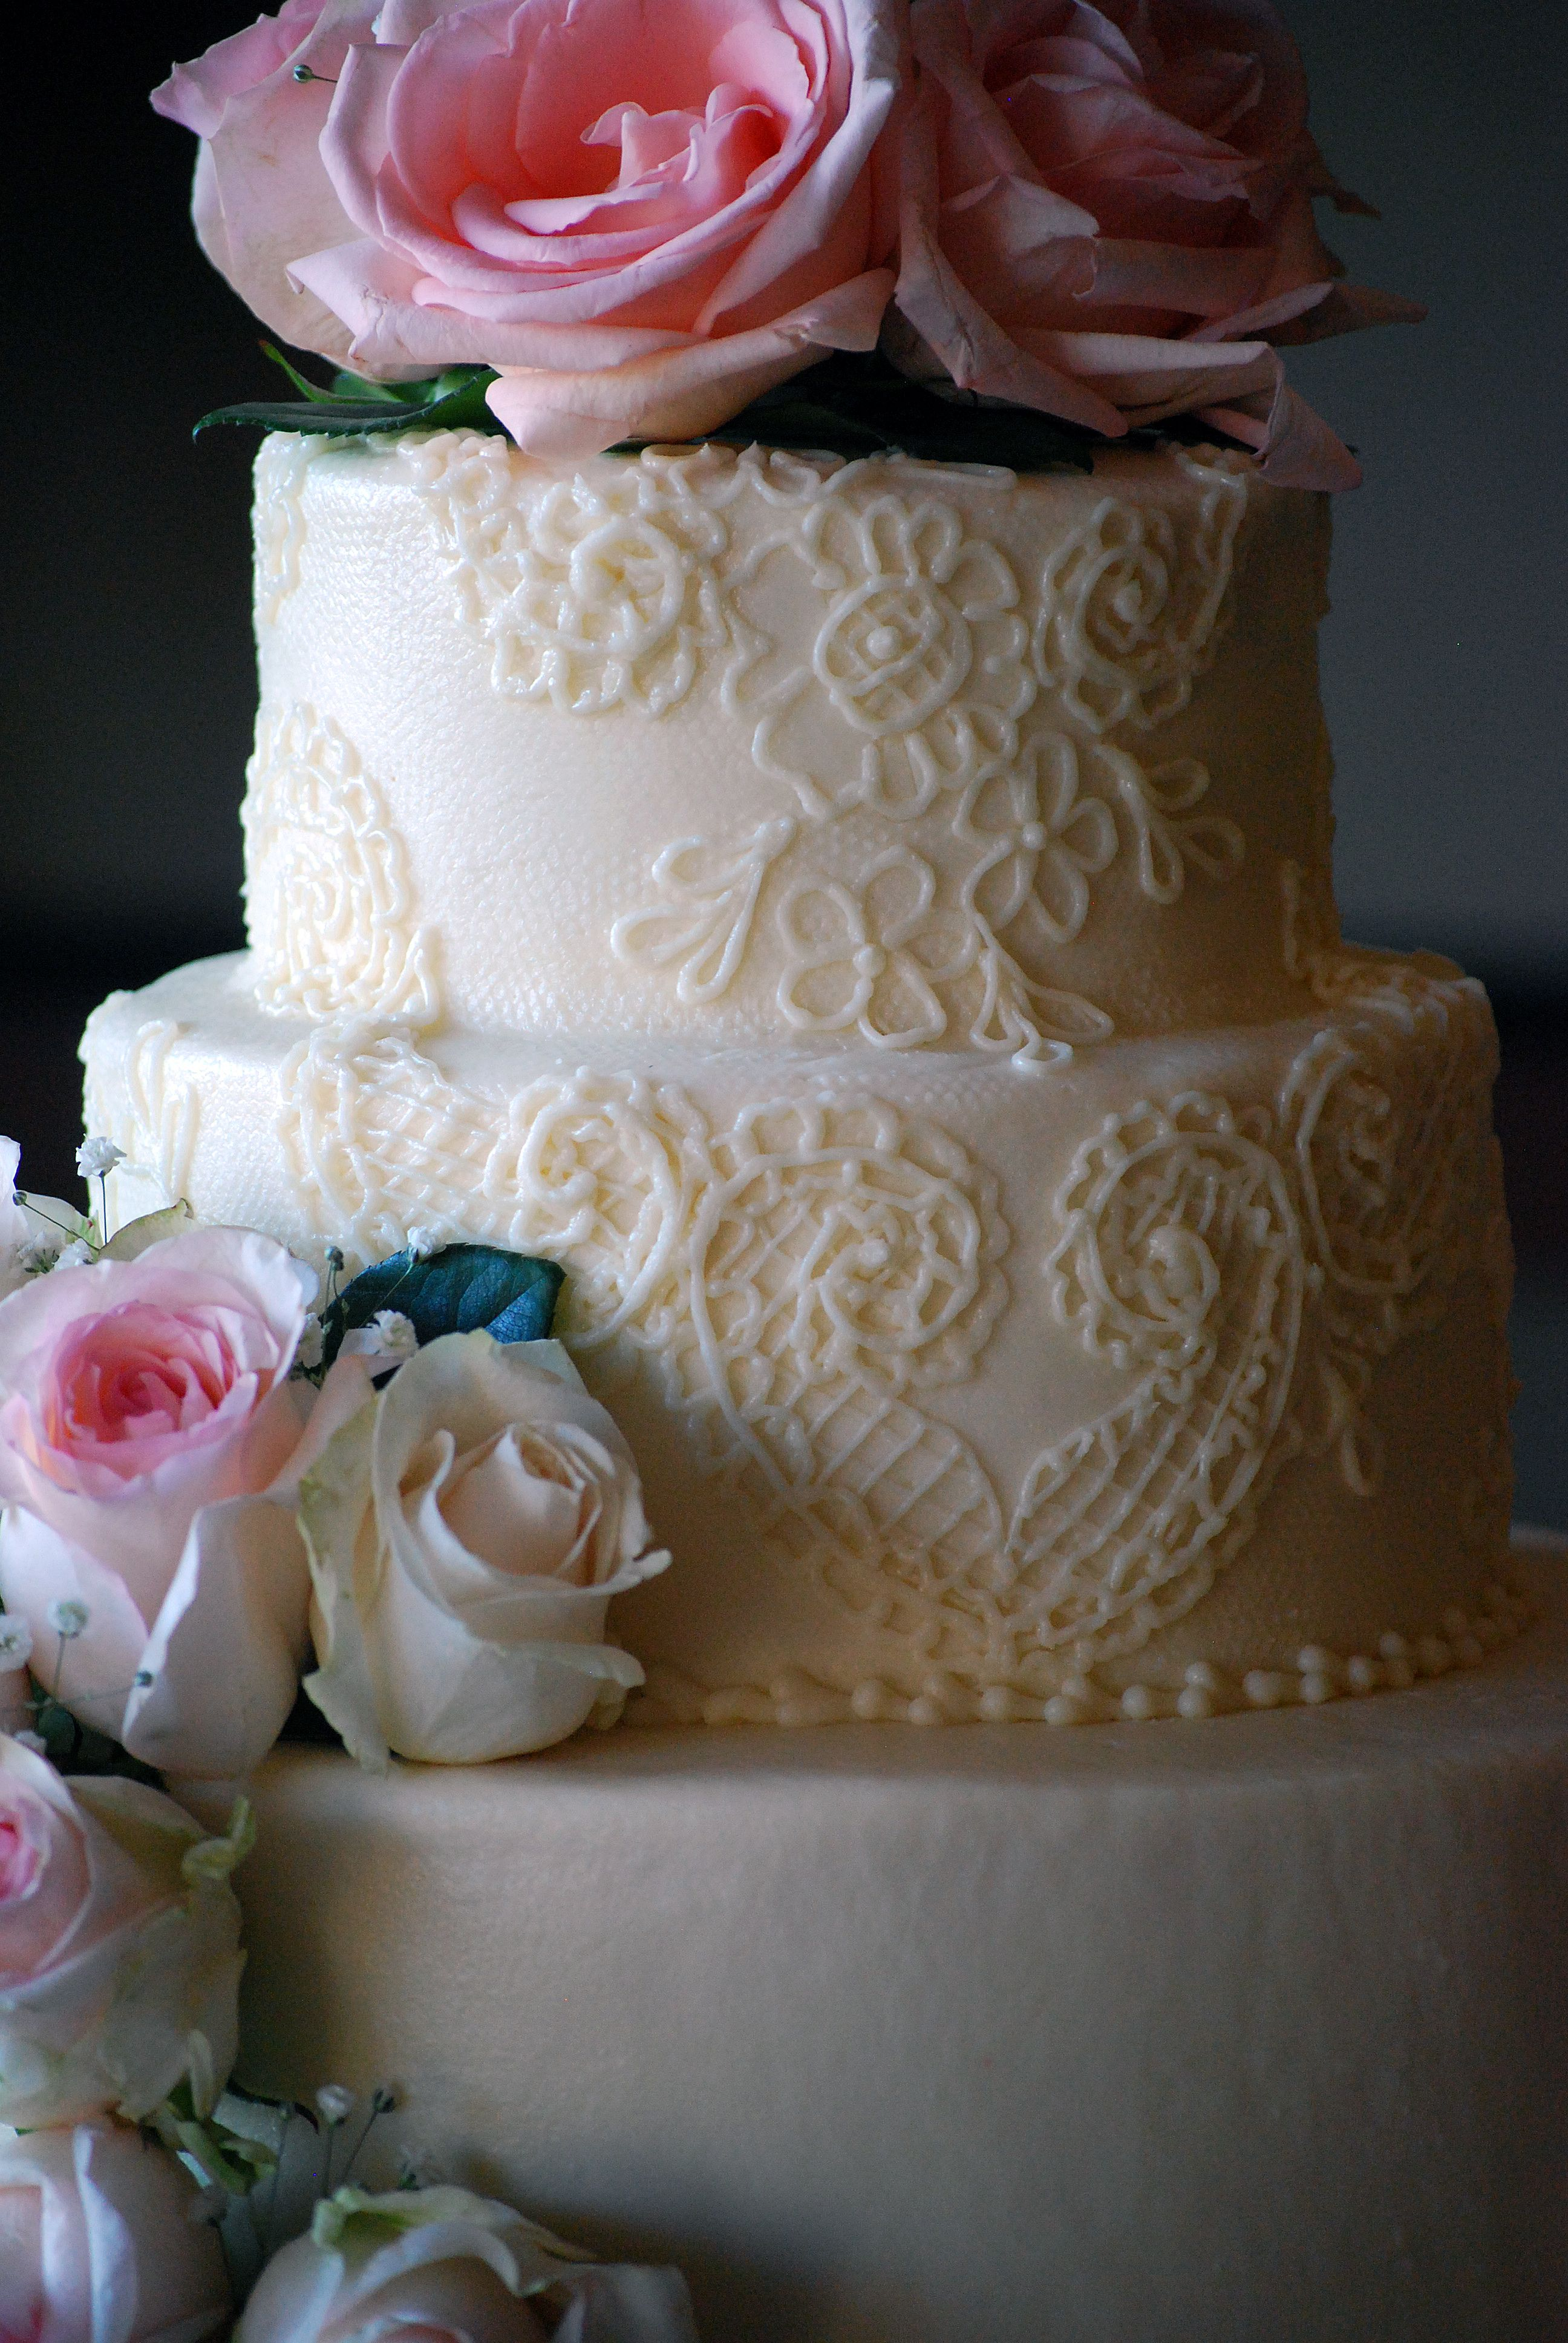 Delicate Alencon Lace Inspired Round Wedding Cake